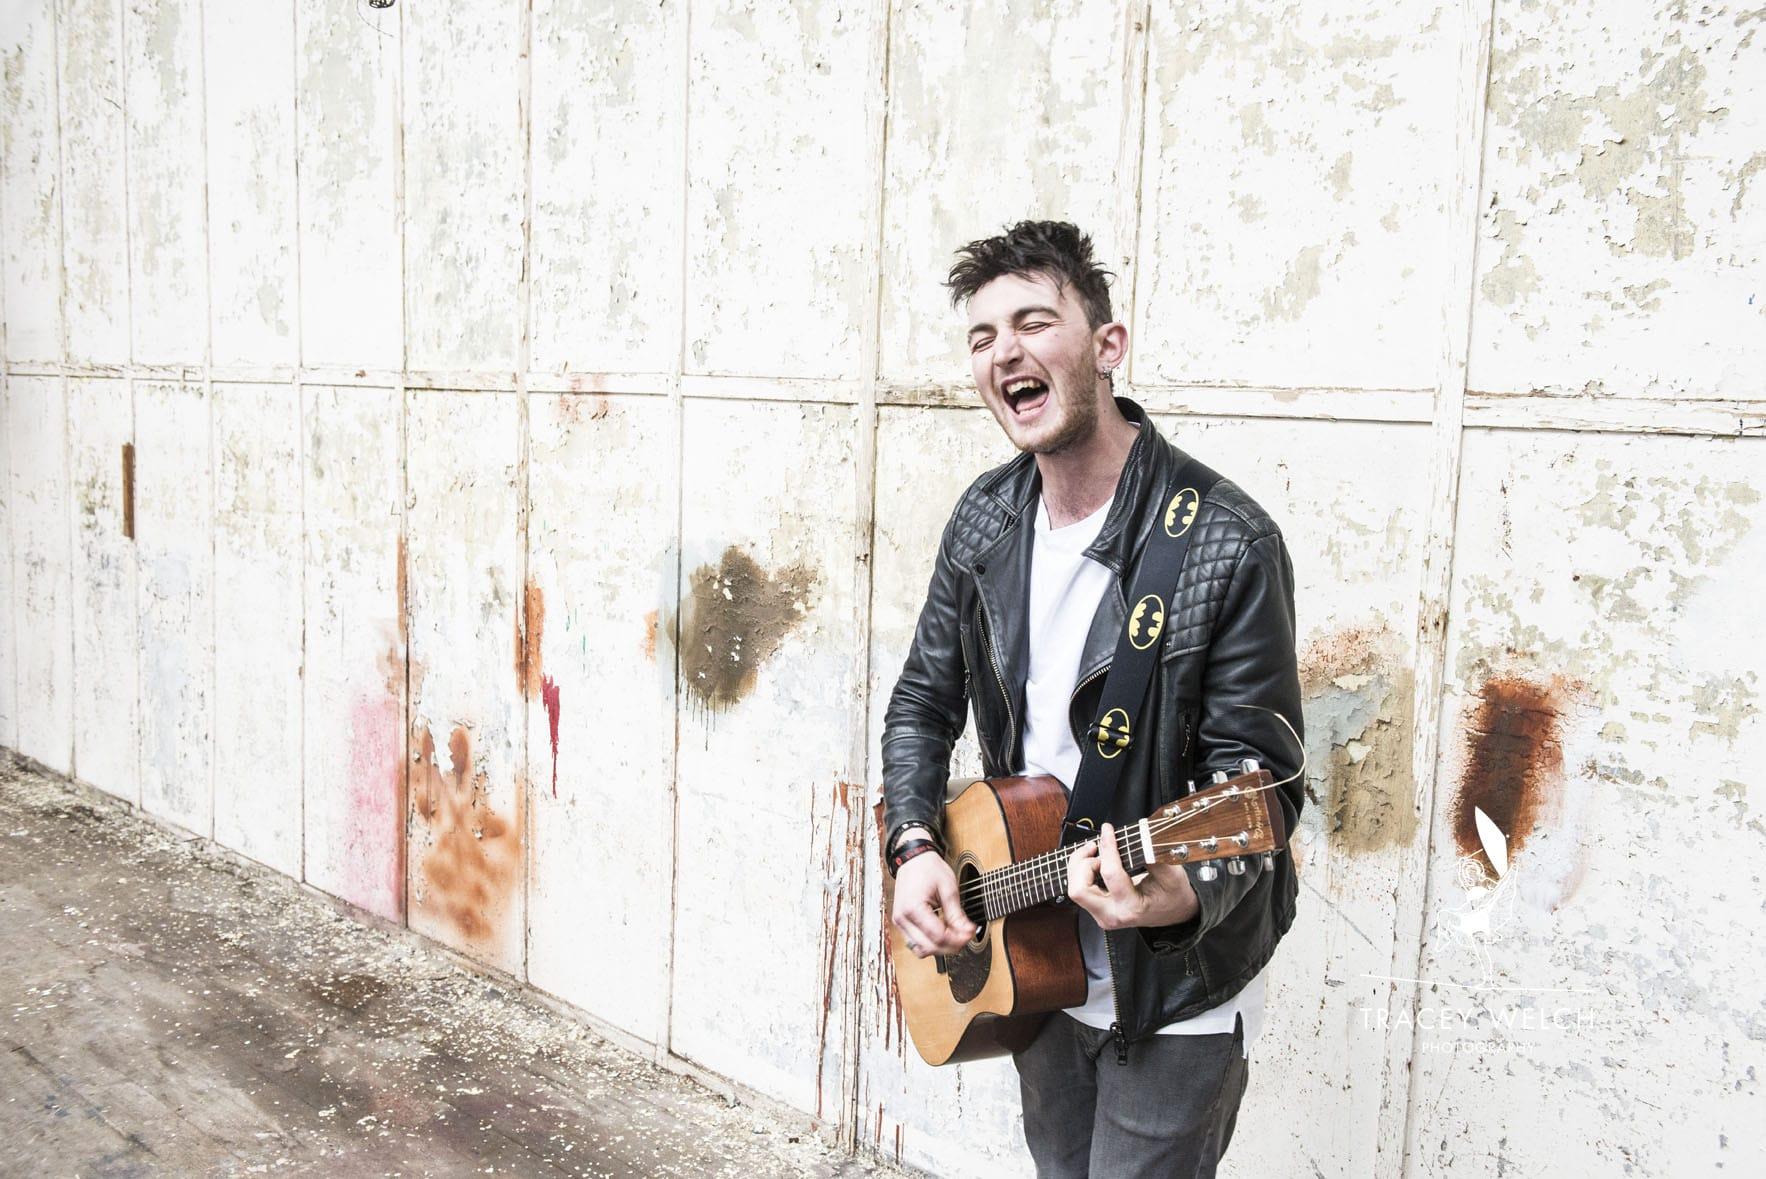 Josh Robins with guitar, Leeds